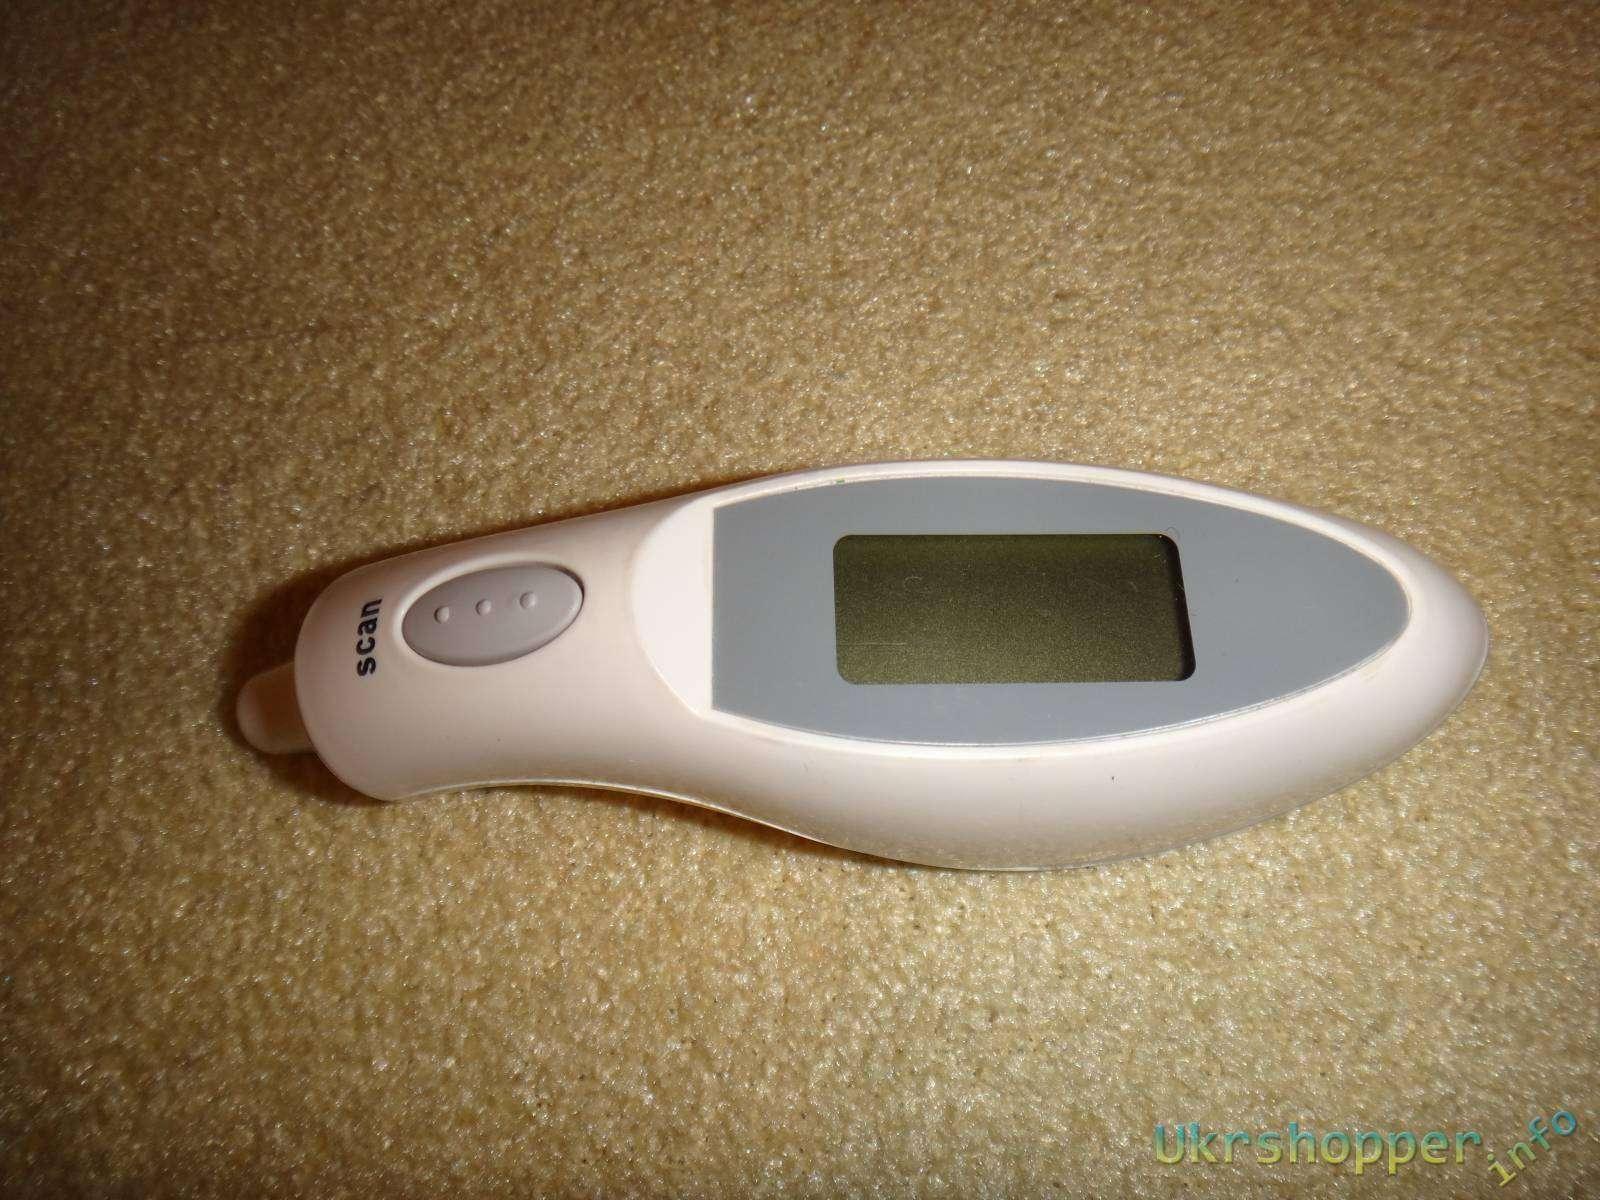 Aliexpress: Обзор электронного инфракрасного термометра